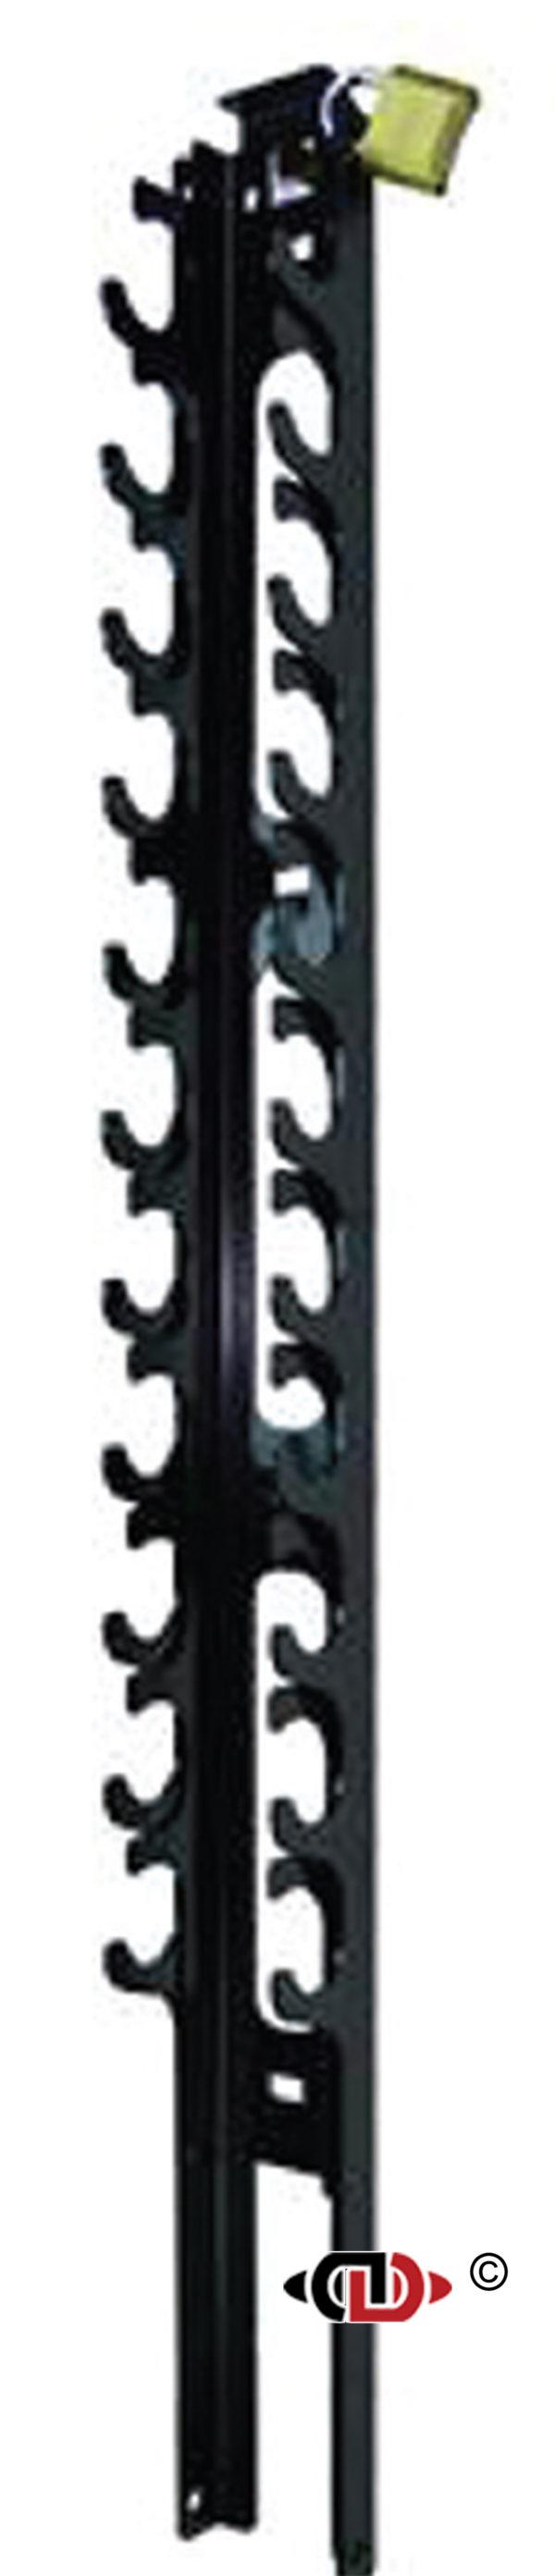 Lockable Aluminum Ratchet Binder Rack - Holds 11 Binders RRA-L11-48